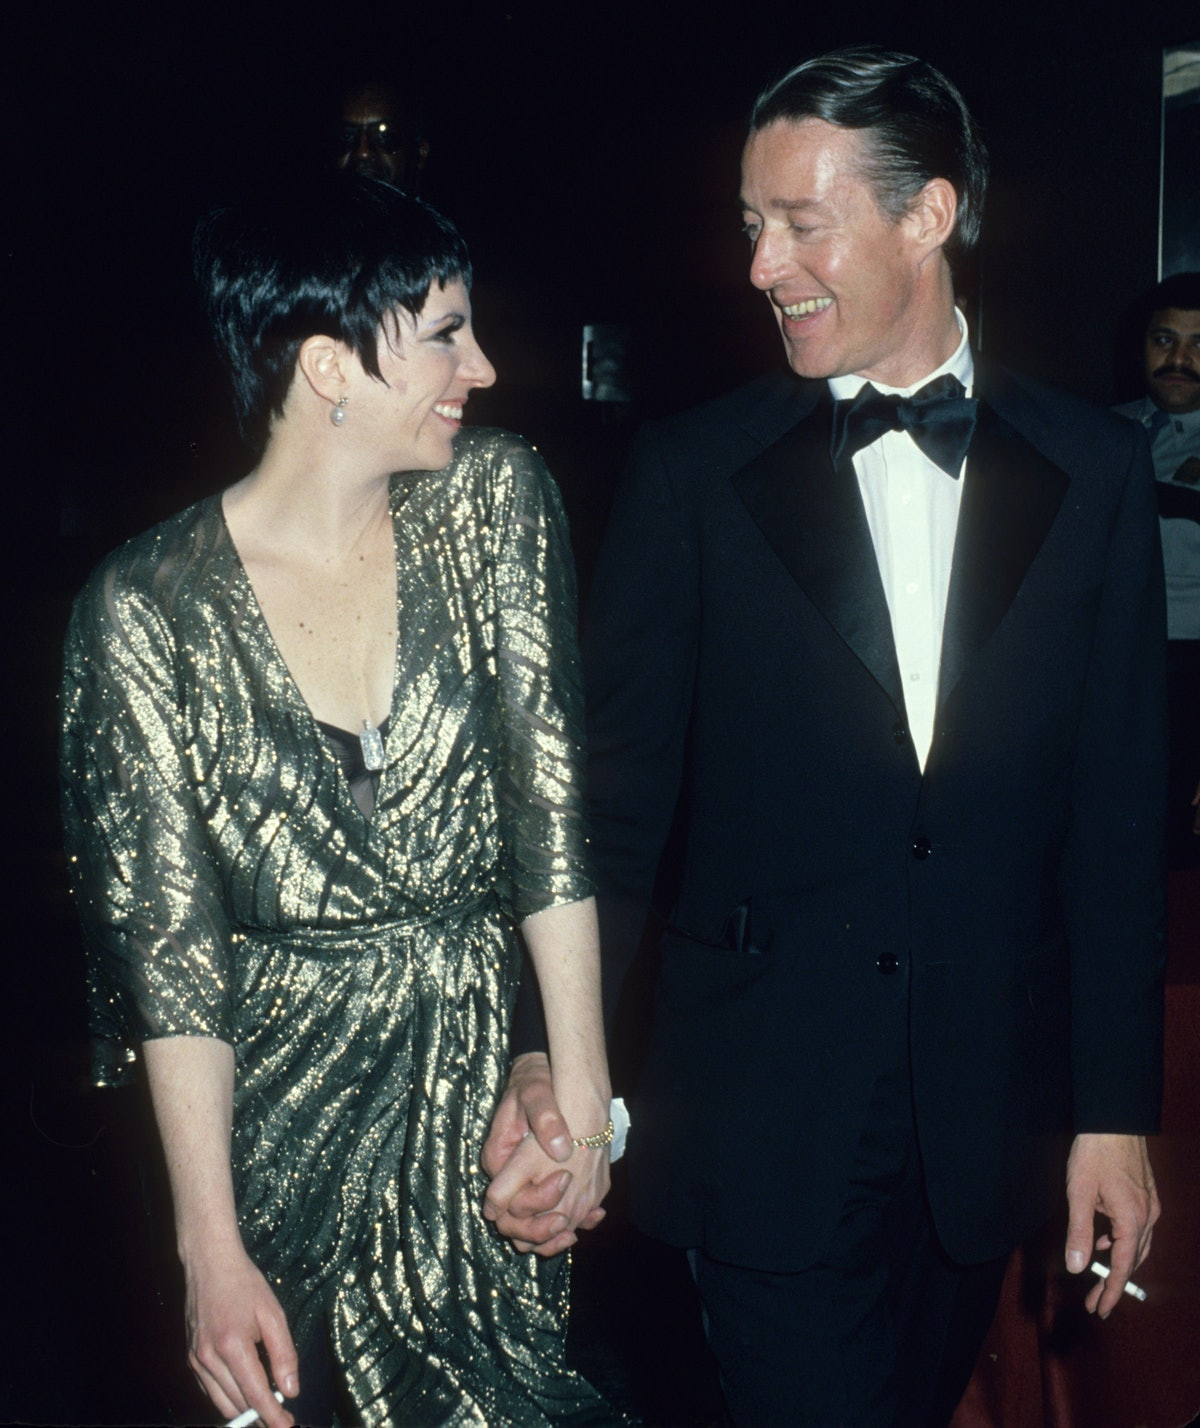 Liza wearing gold Halston in a black suit